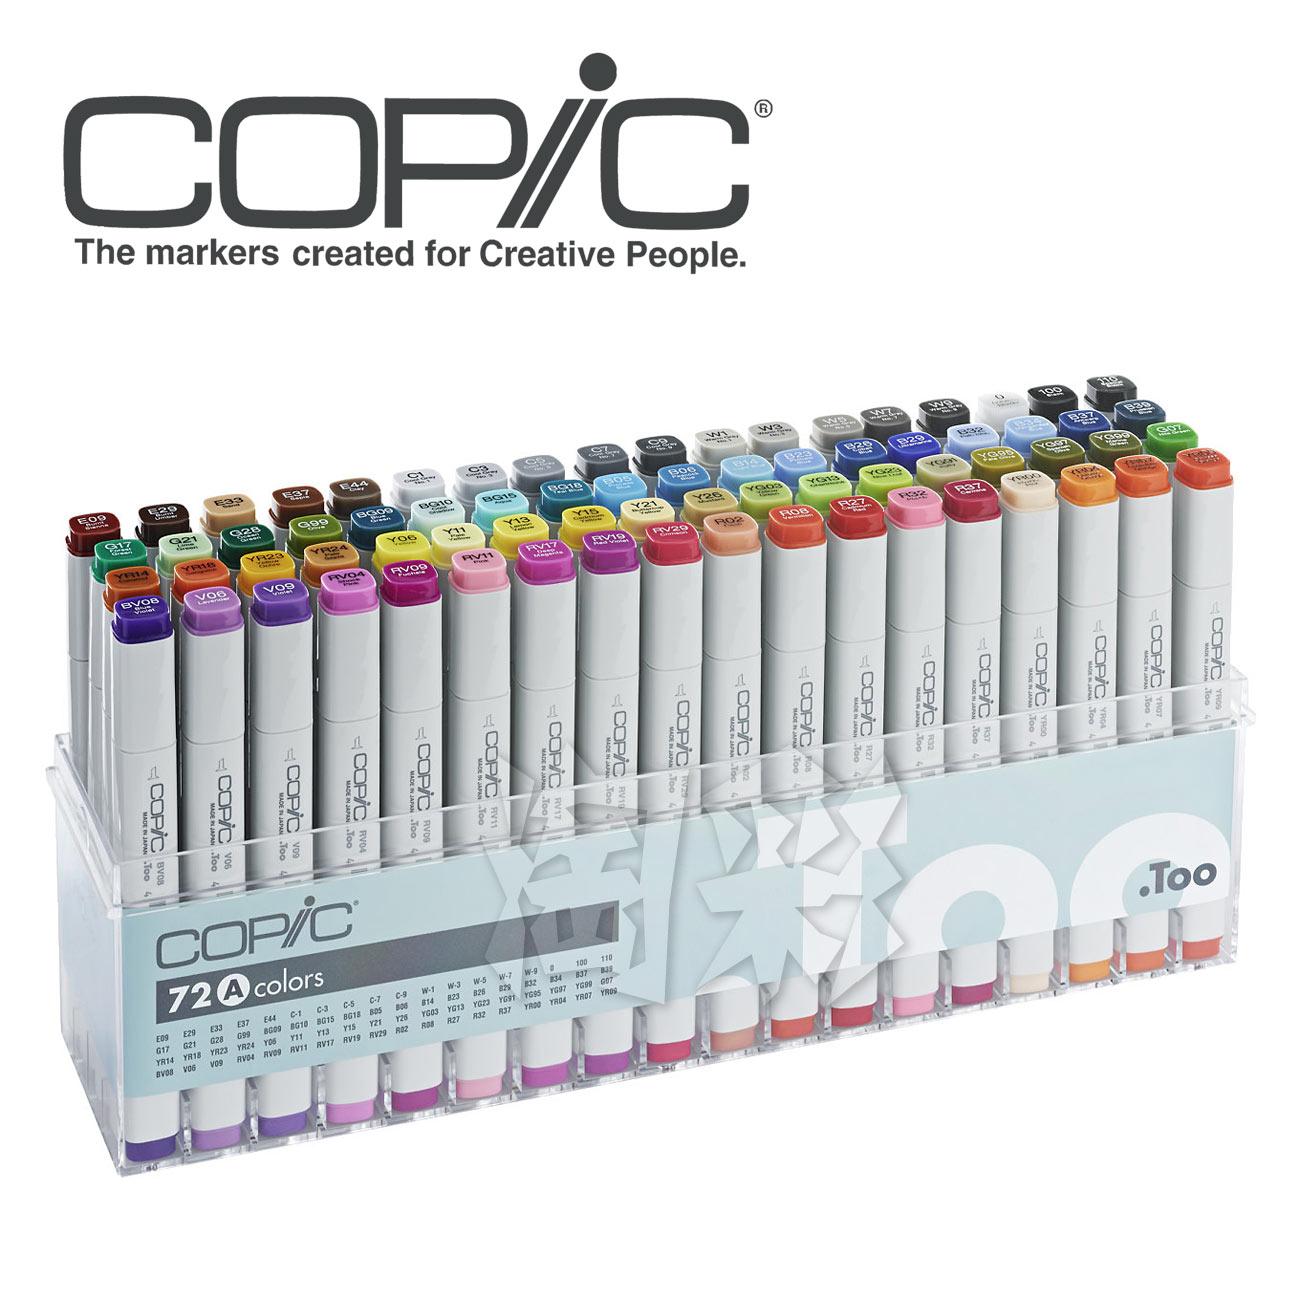 alcohol 72a 72b 72c colors copic markers informs copic. Black Bedroom Furniture Sets. Home Design Ideas